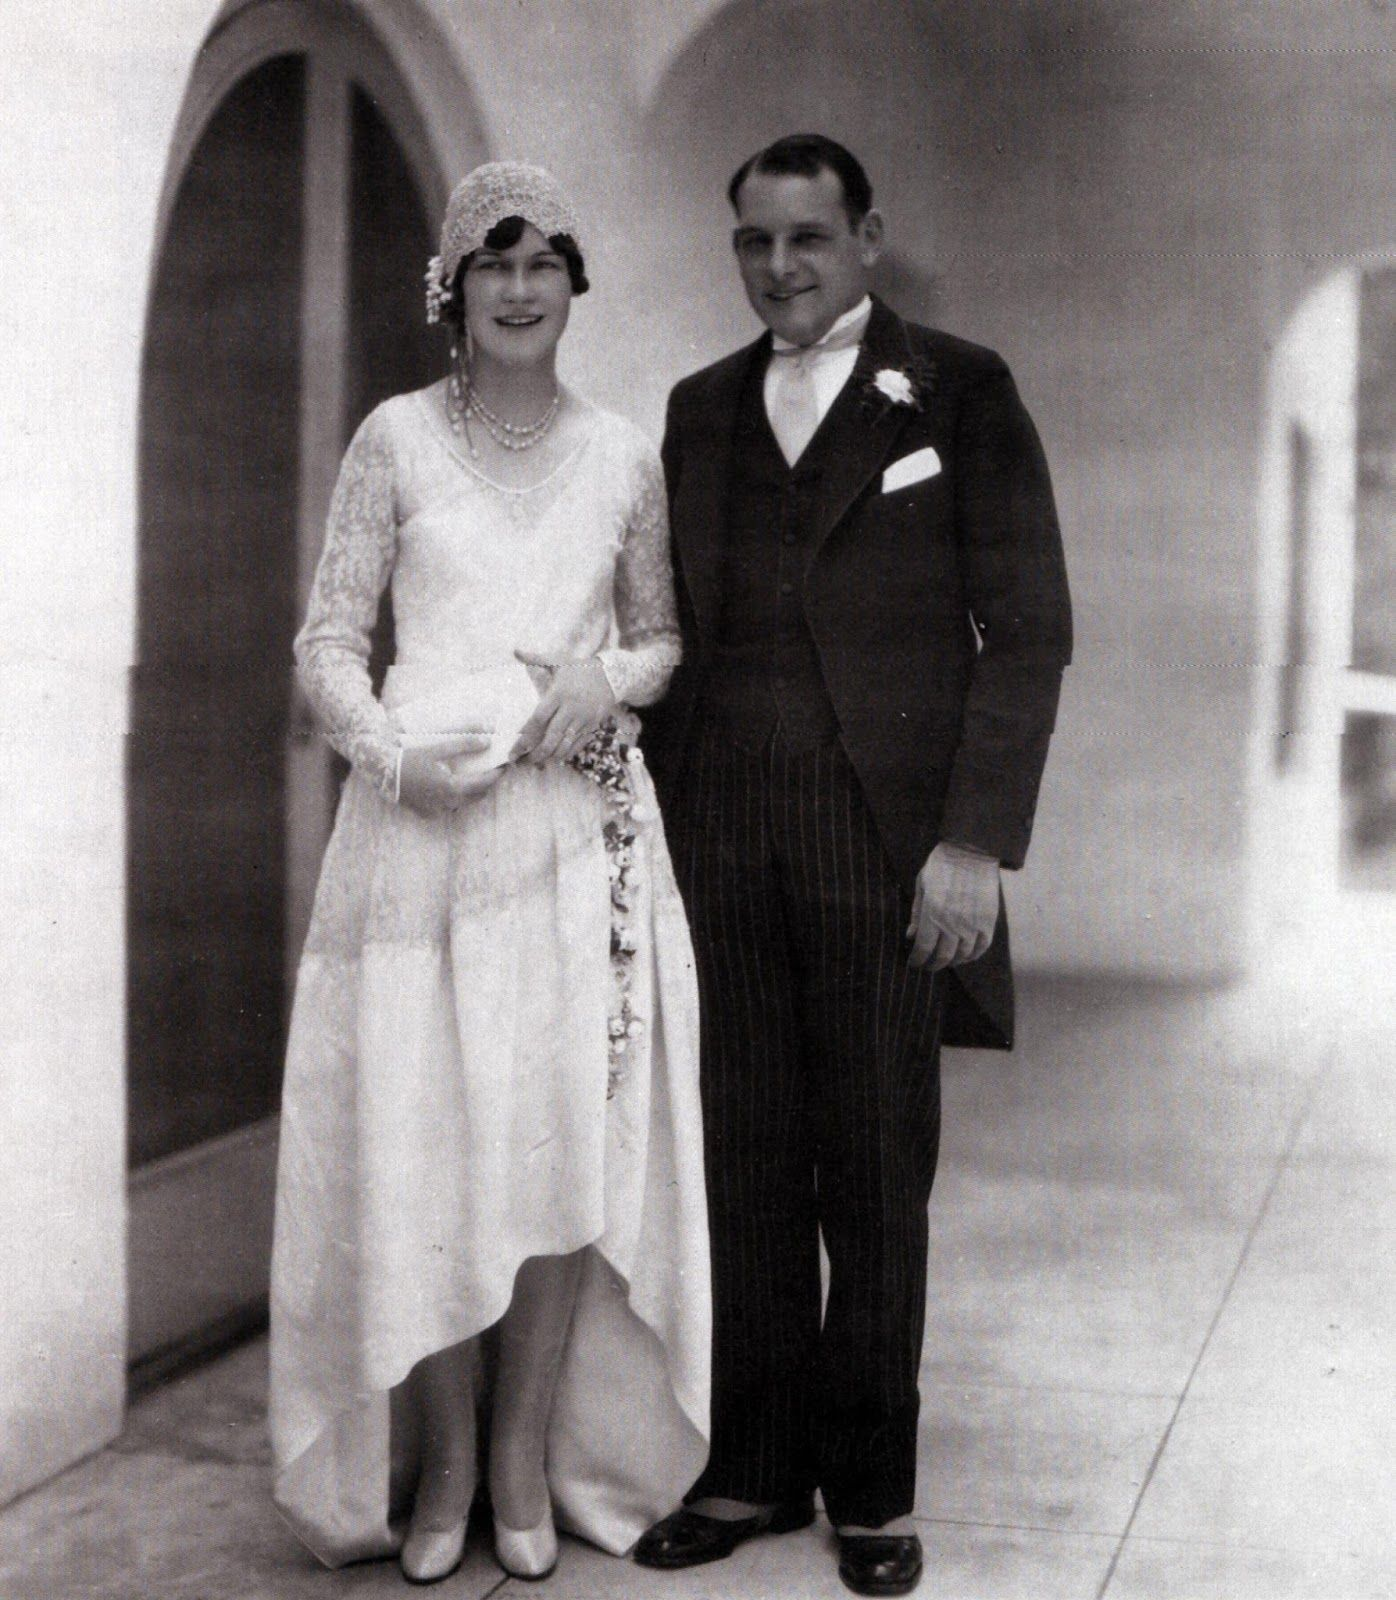 1920s Vintage Wedding Ideas: 1928 Bride And Groom. In 2019